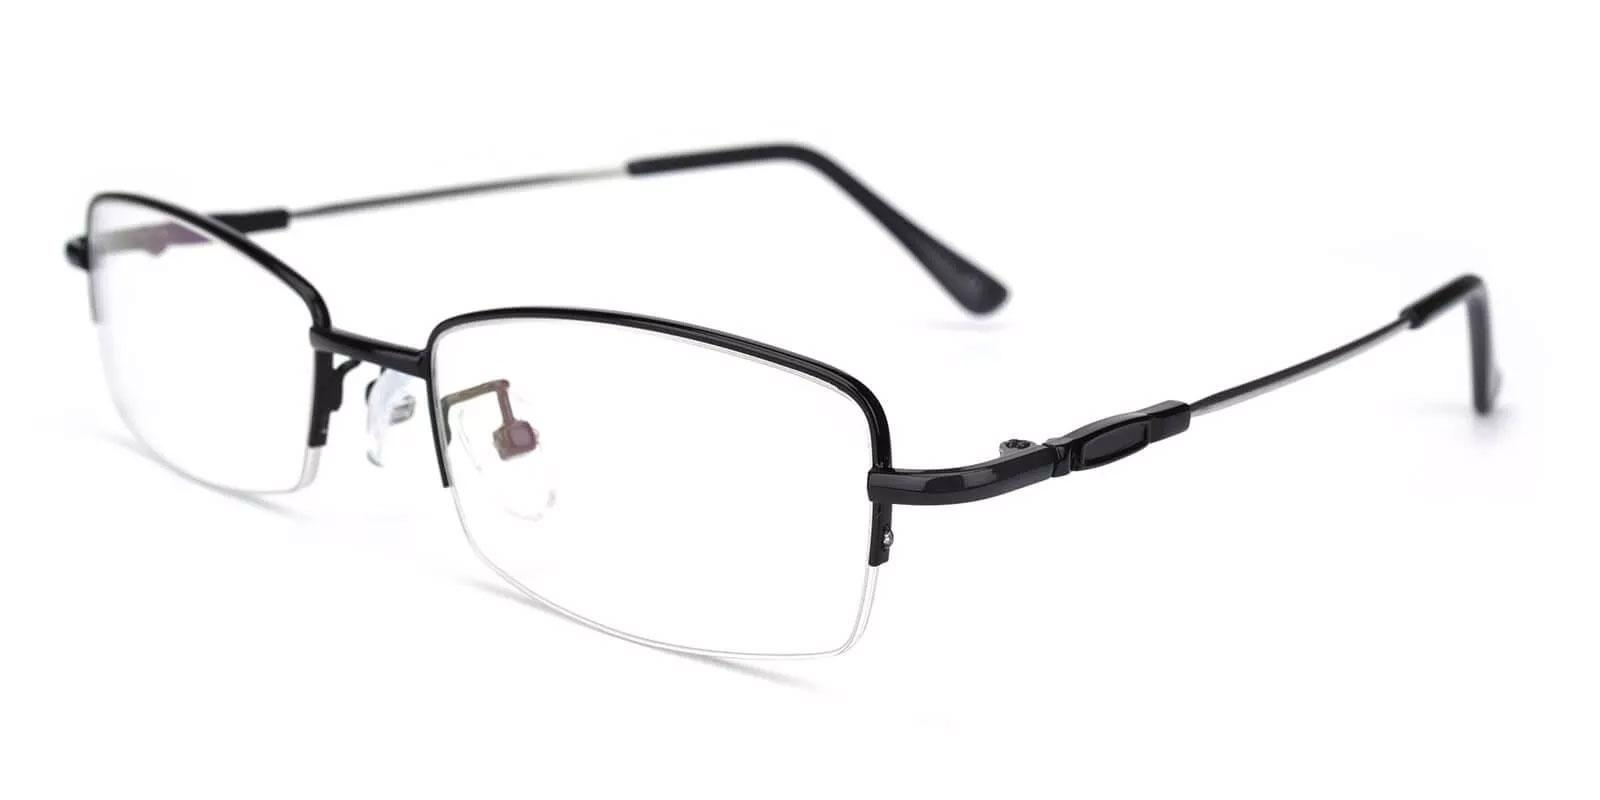 Benjamin Black Metal Eyeglasses , NosePads Frames from ABBE Glasses